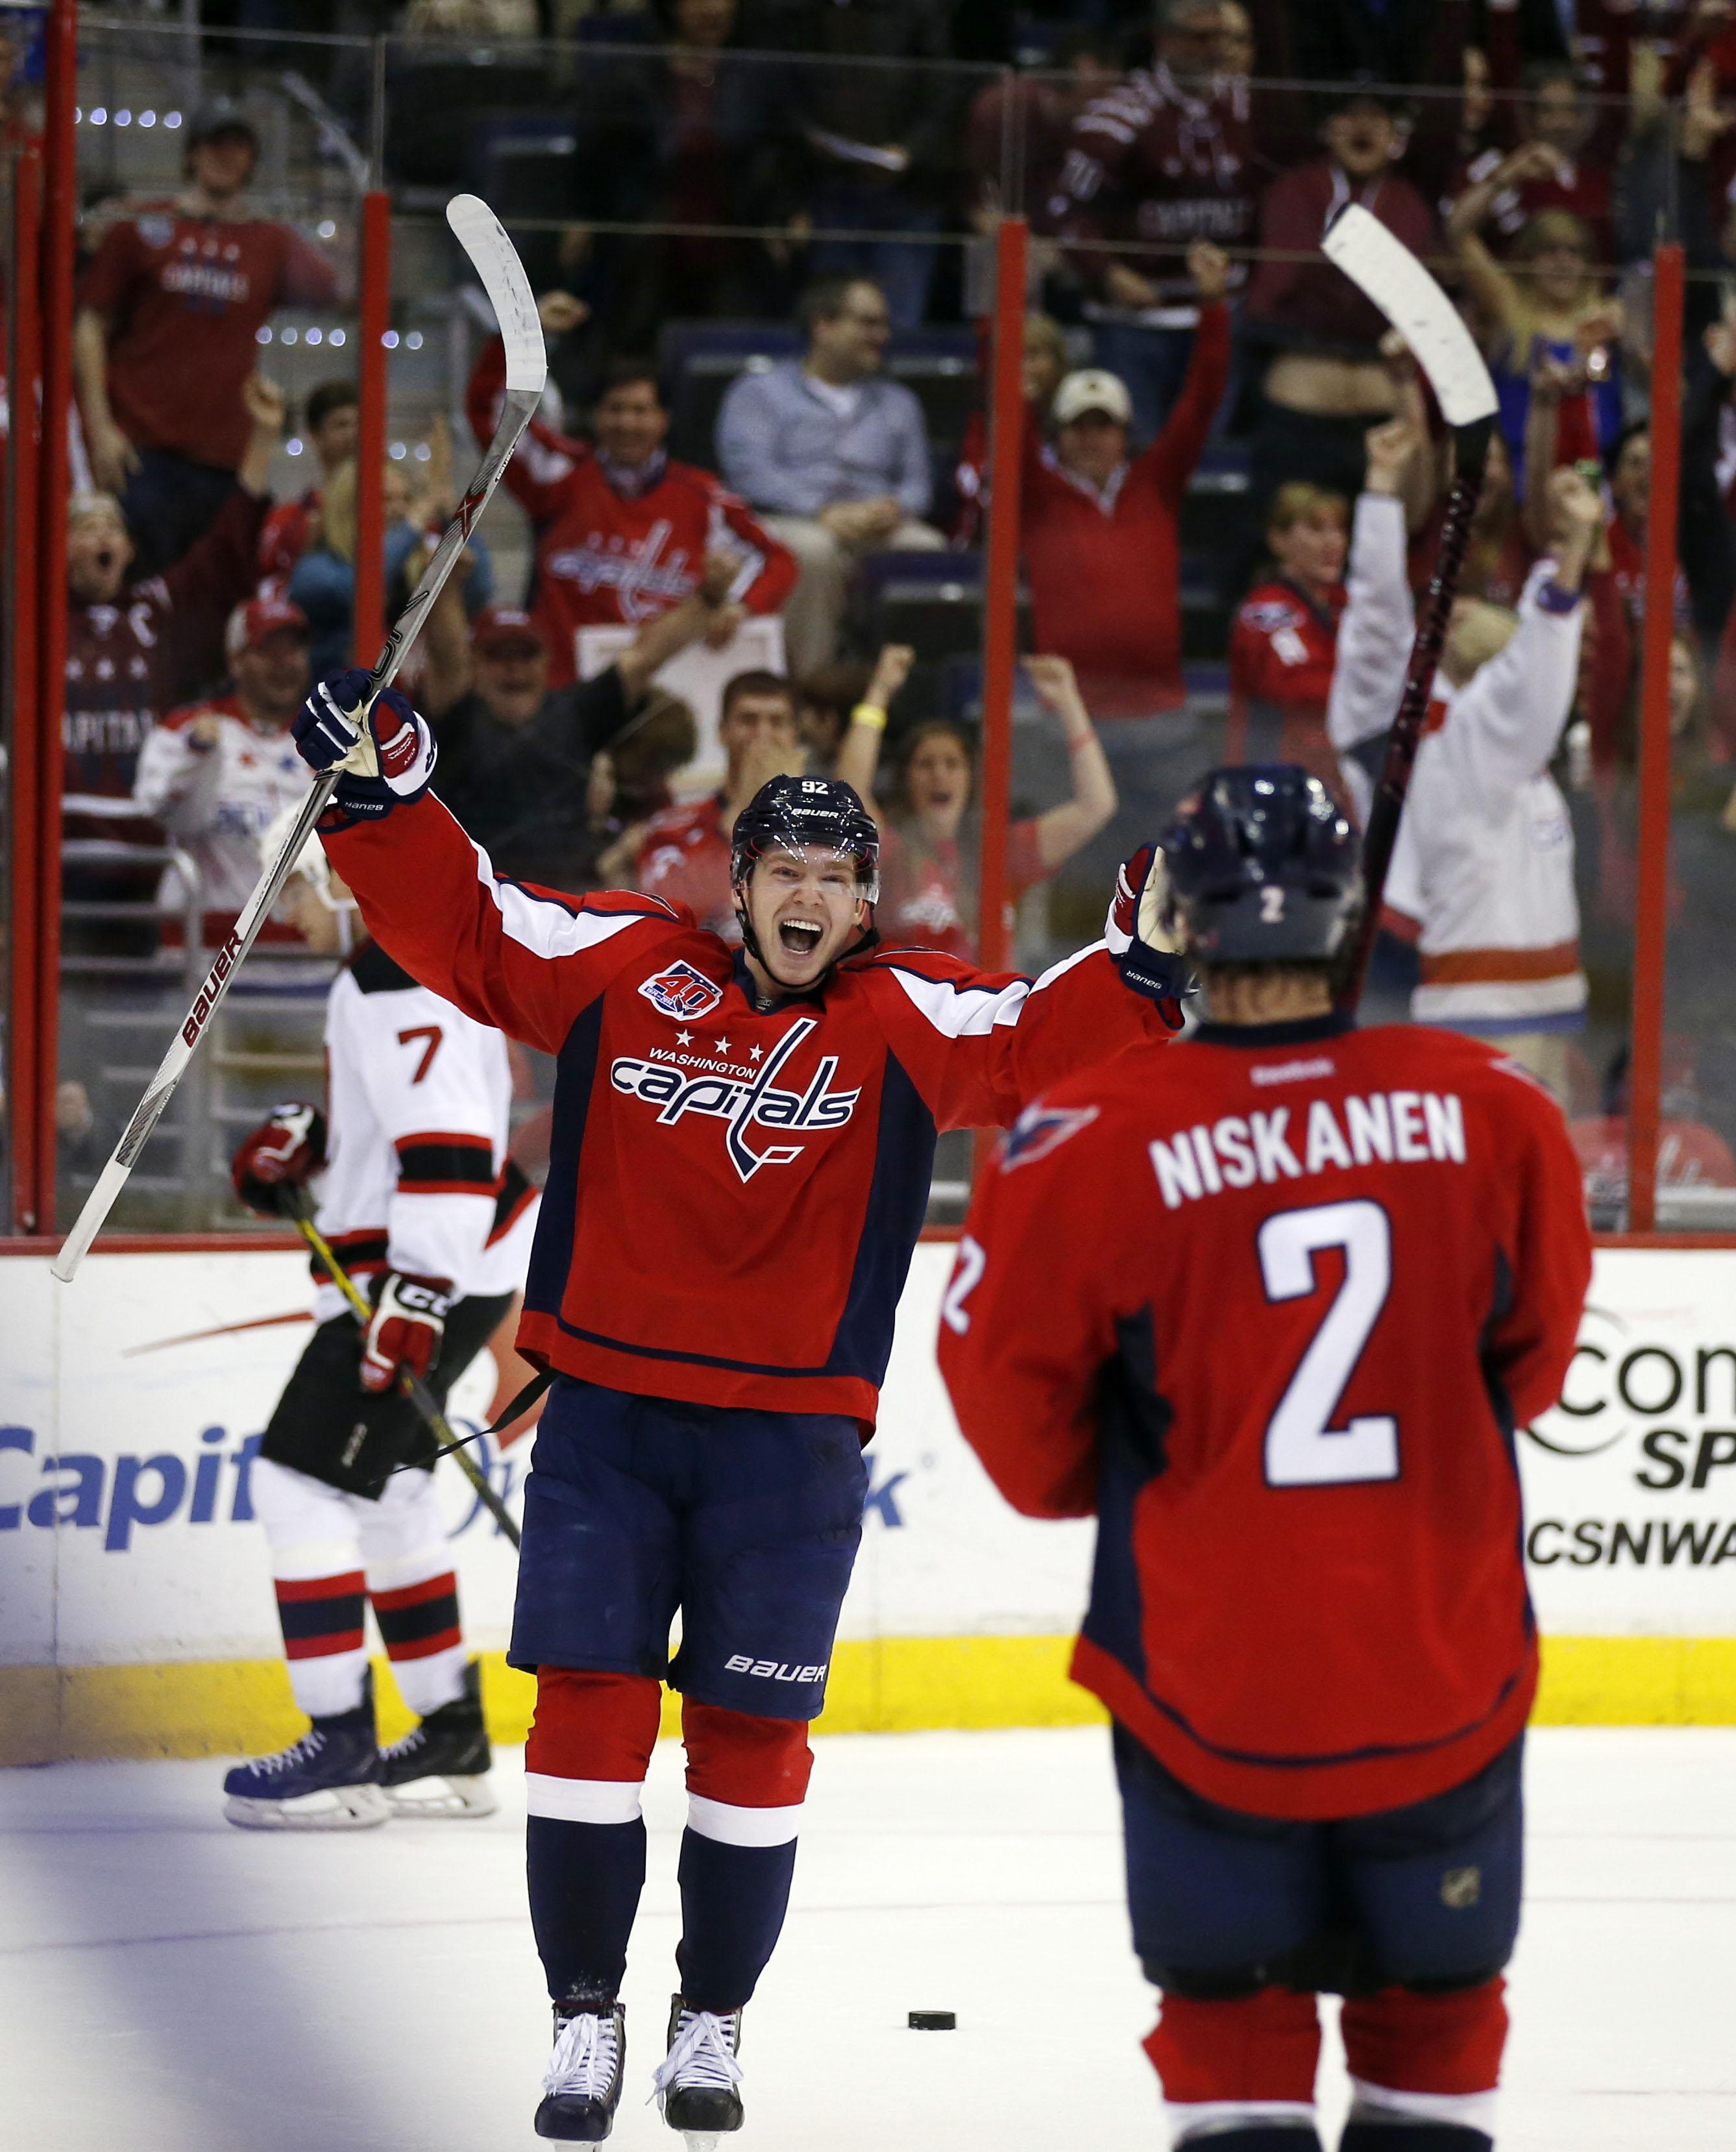 Matt Niskanen s overtime goal leads Capitals to crucial victory over Devils  - Washington Times 4e47f8e1668